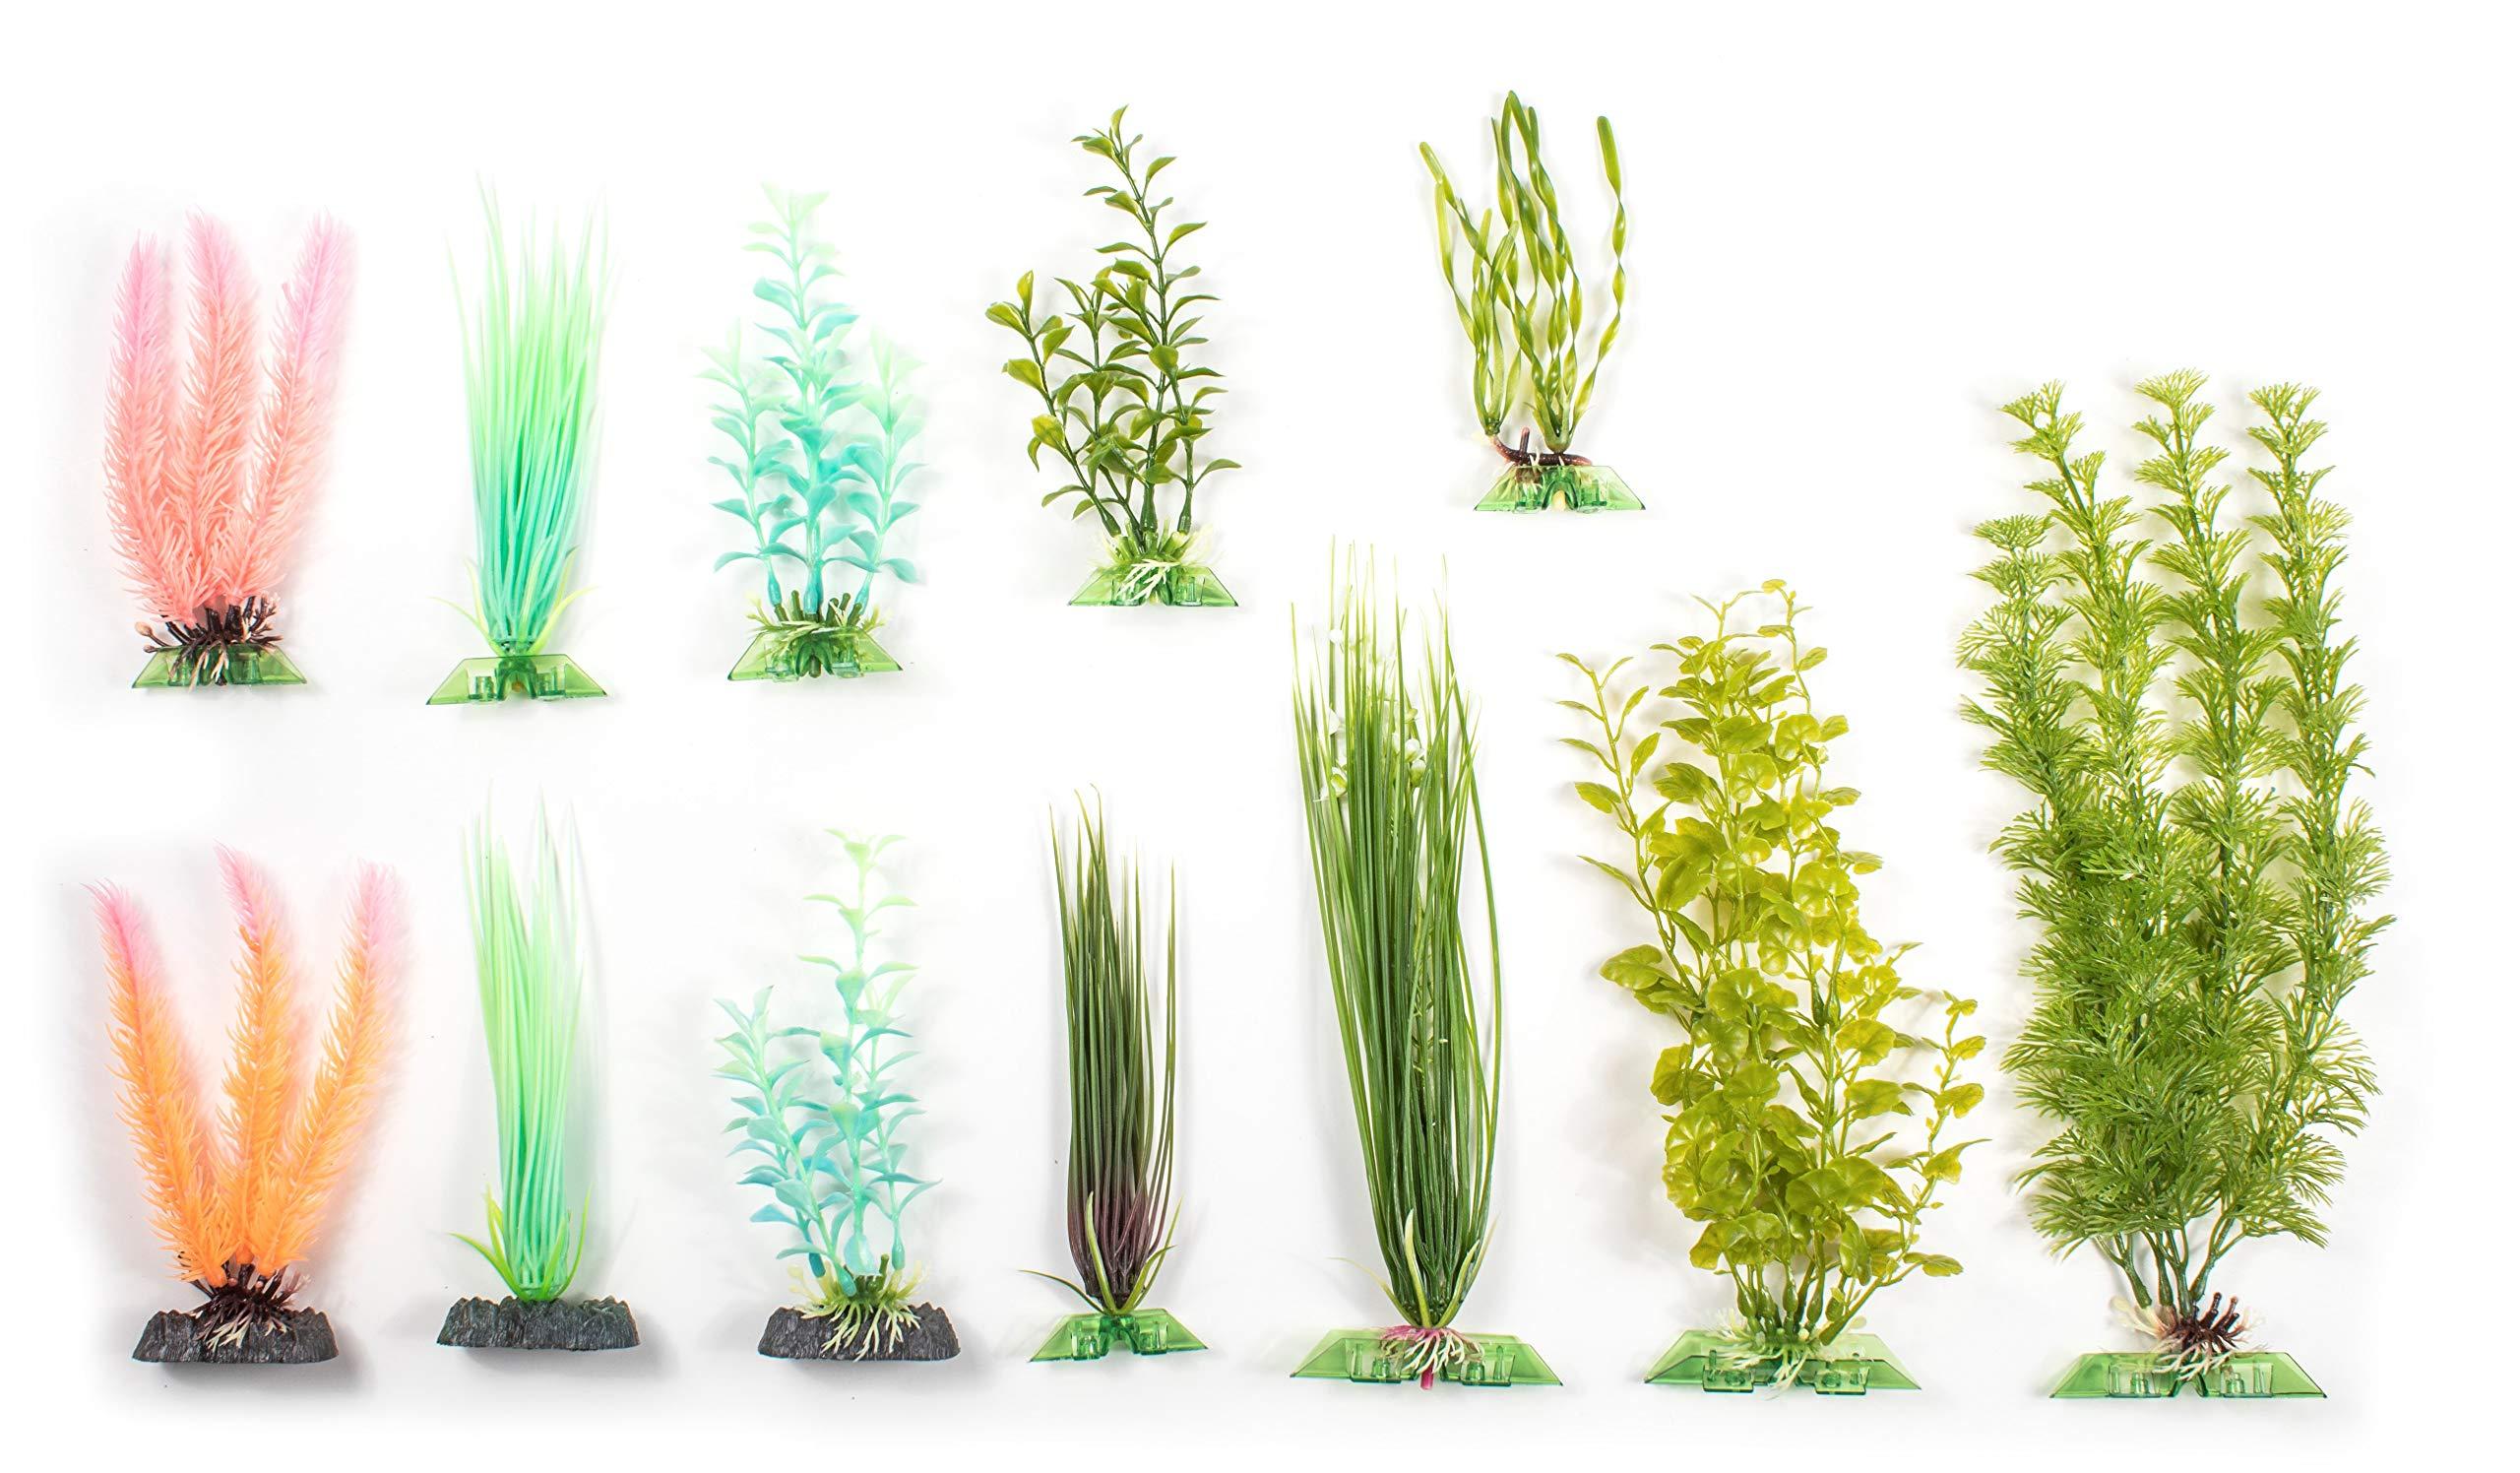 Penn Plax Twelve Piece Aquarium Plant Gift Set - Everything You Need for a 10 Gallon Fish Tank by Penn Plax